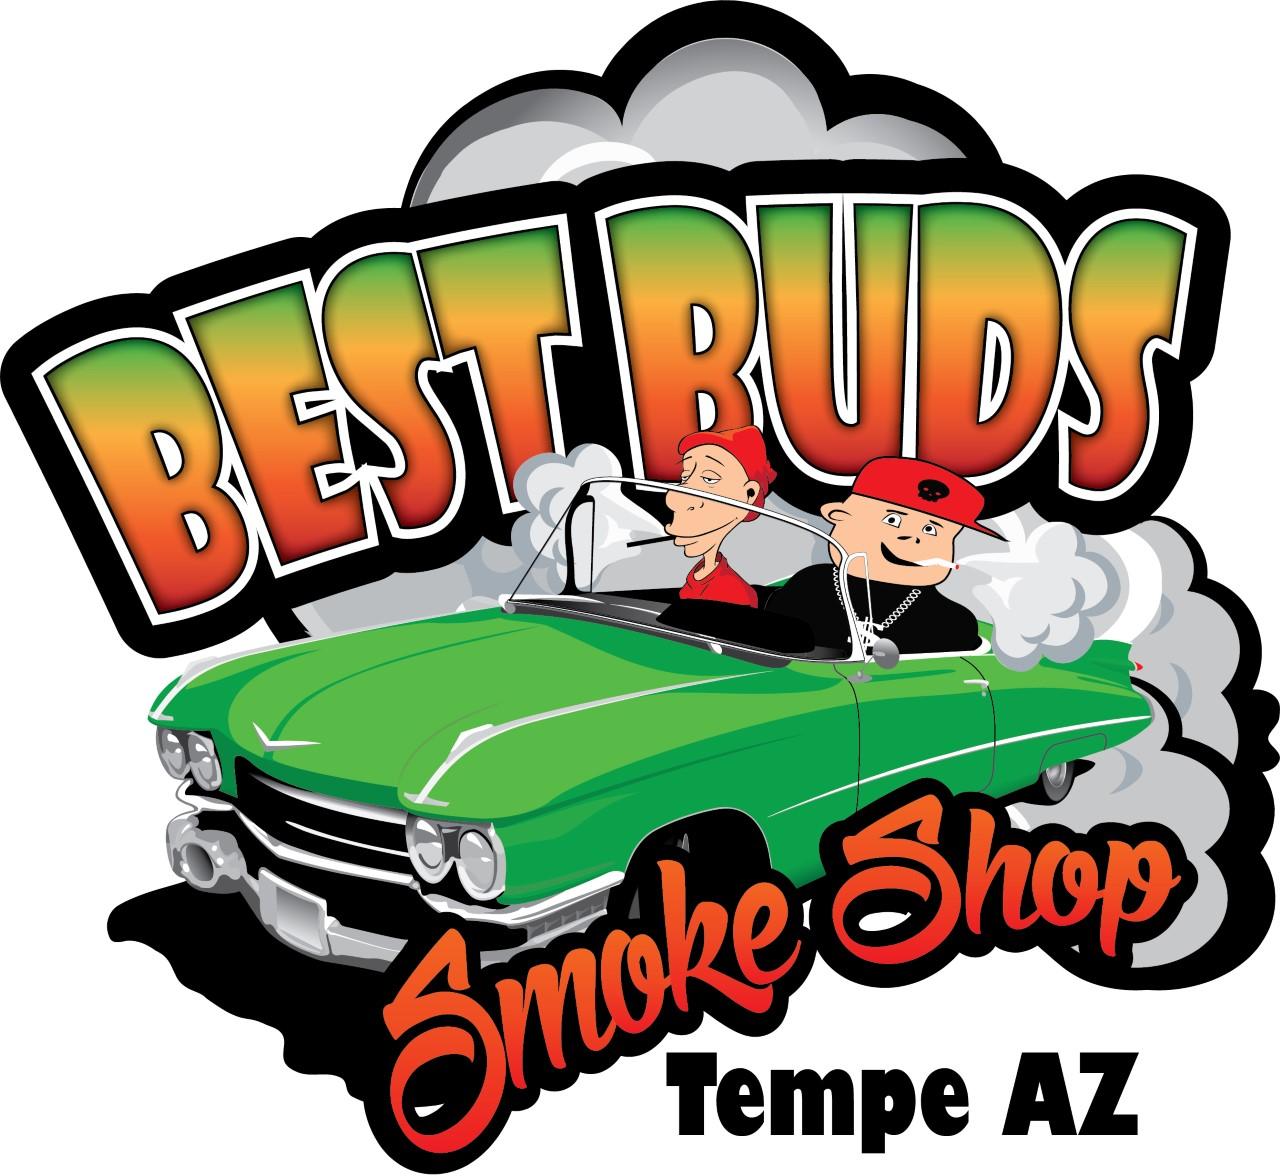 thumbnail_Best Buds Smoke Shop Logo (1).jpg